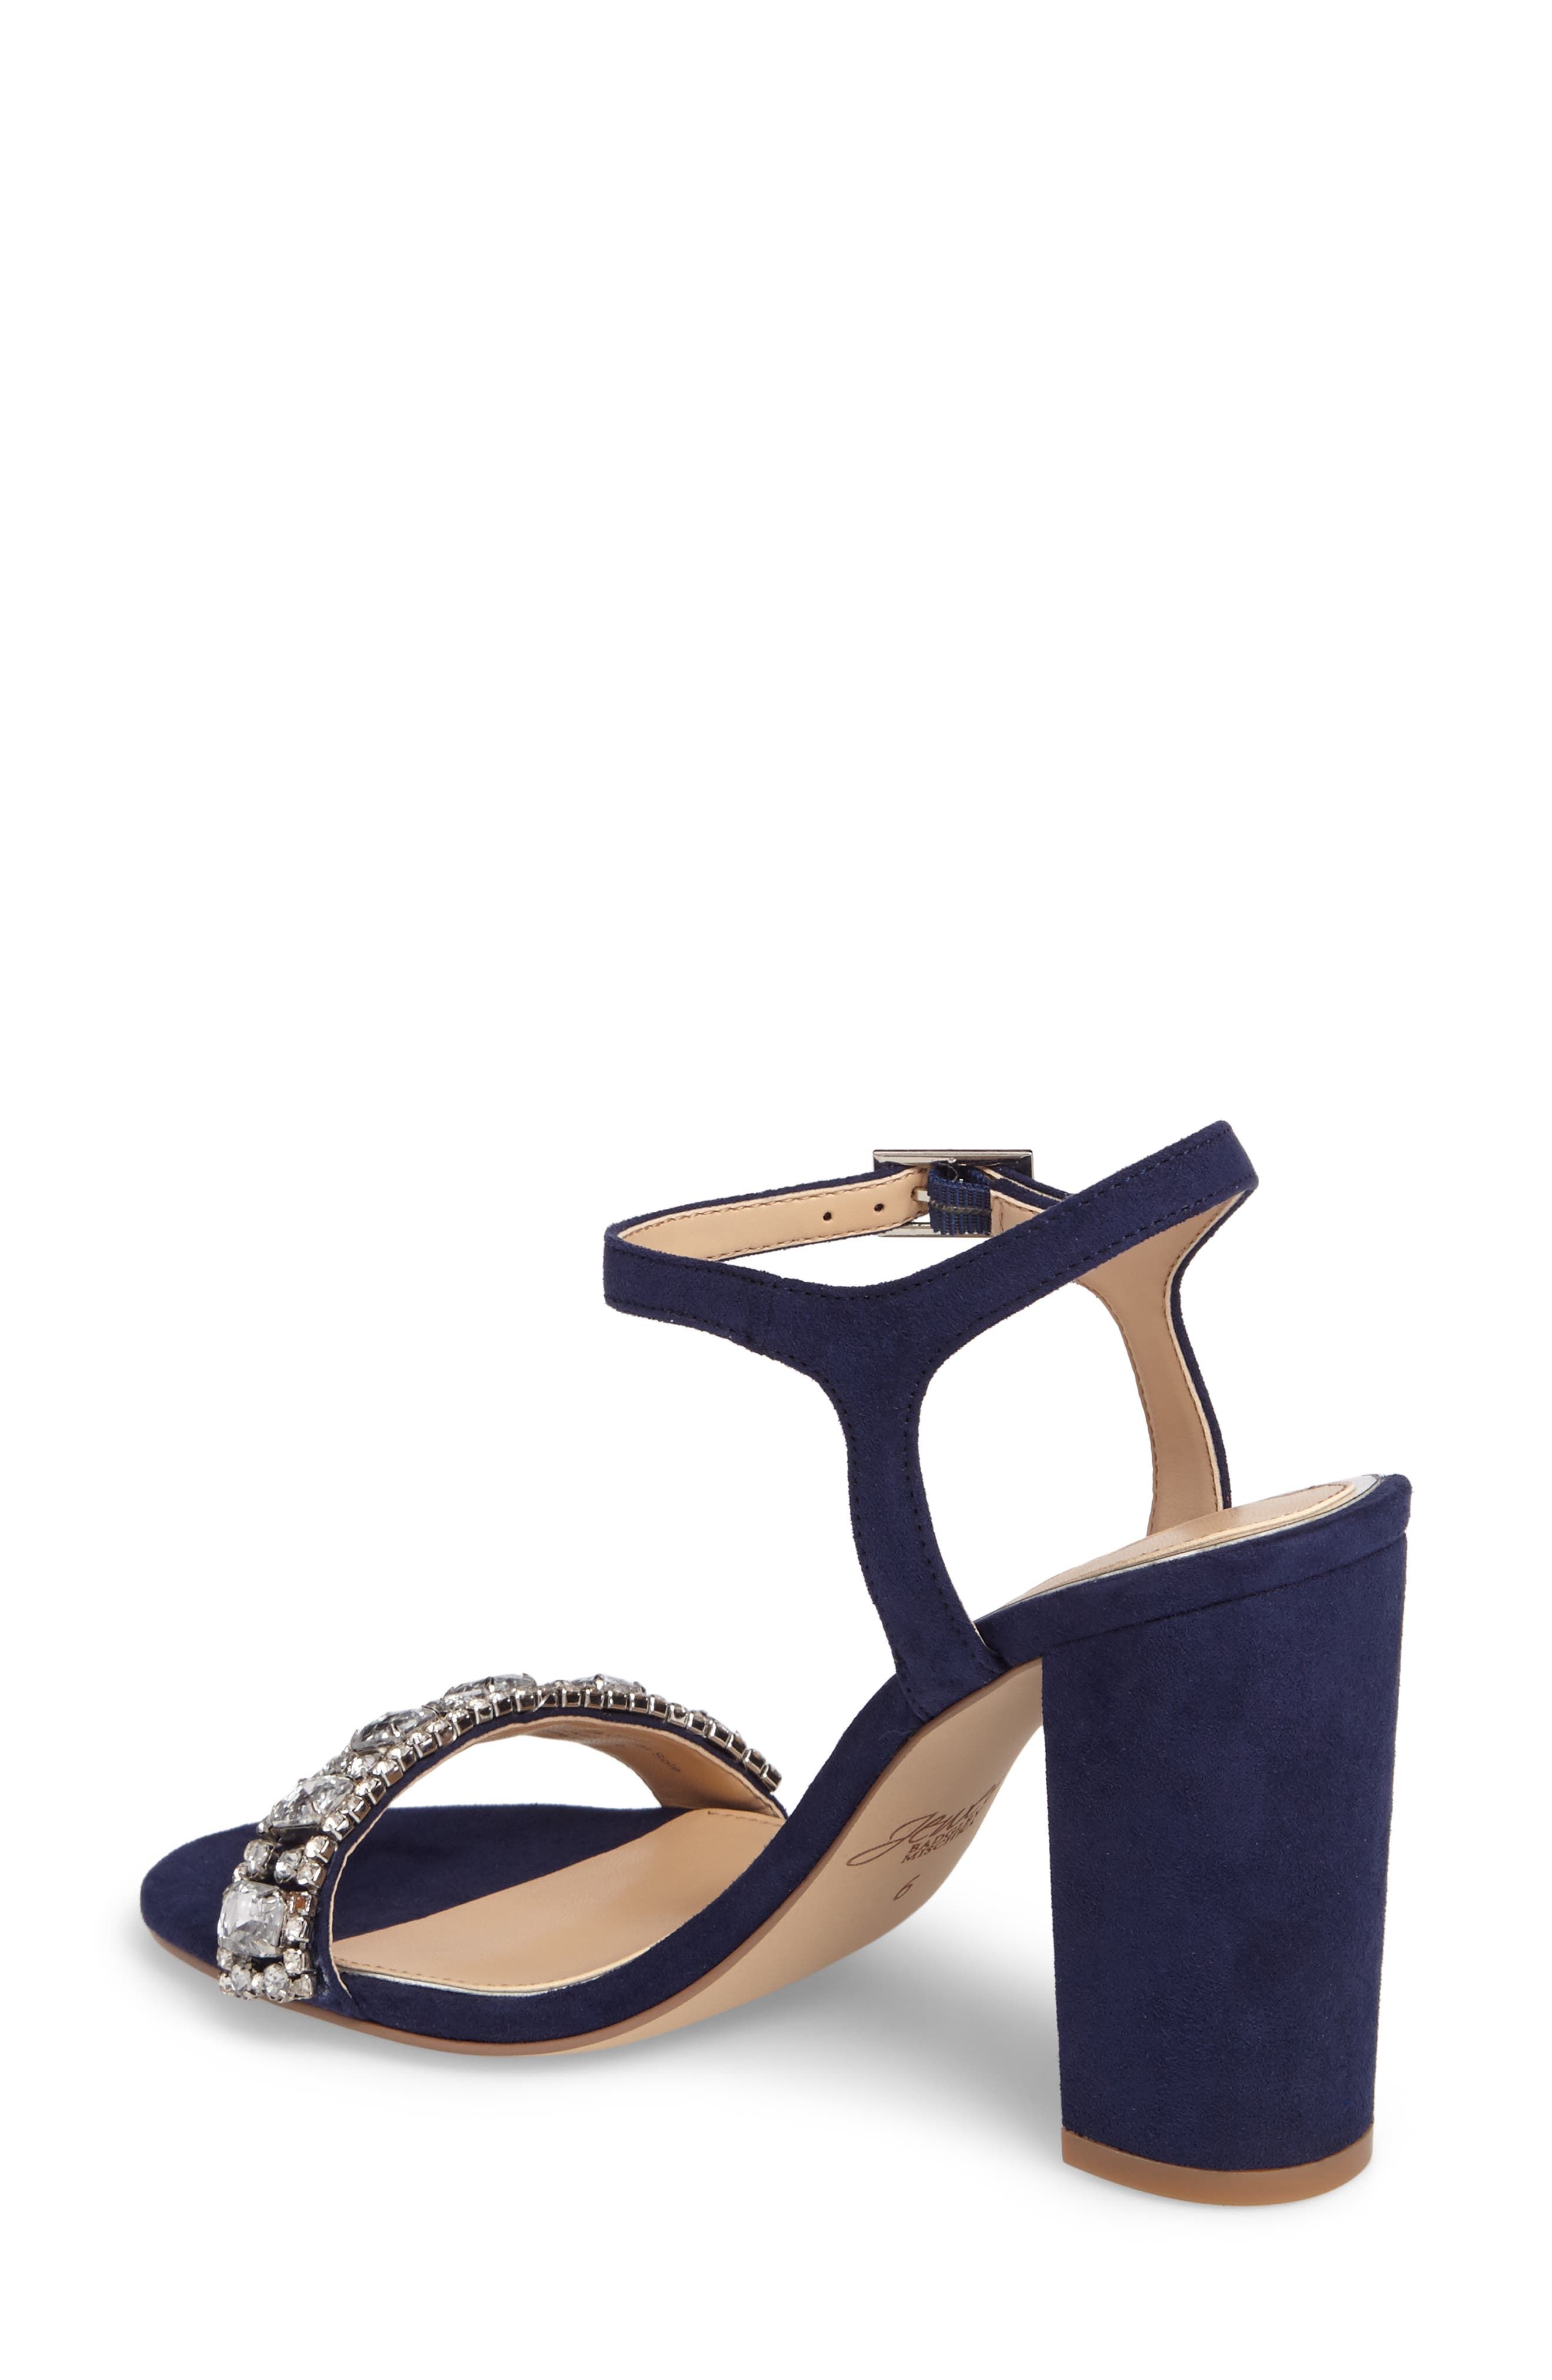 Hendricks Embellished Block Heel Sandal,                             Alternate thumbnail 2, color,                             Navy Suede